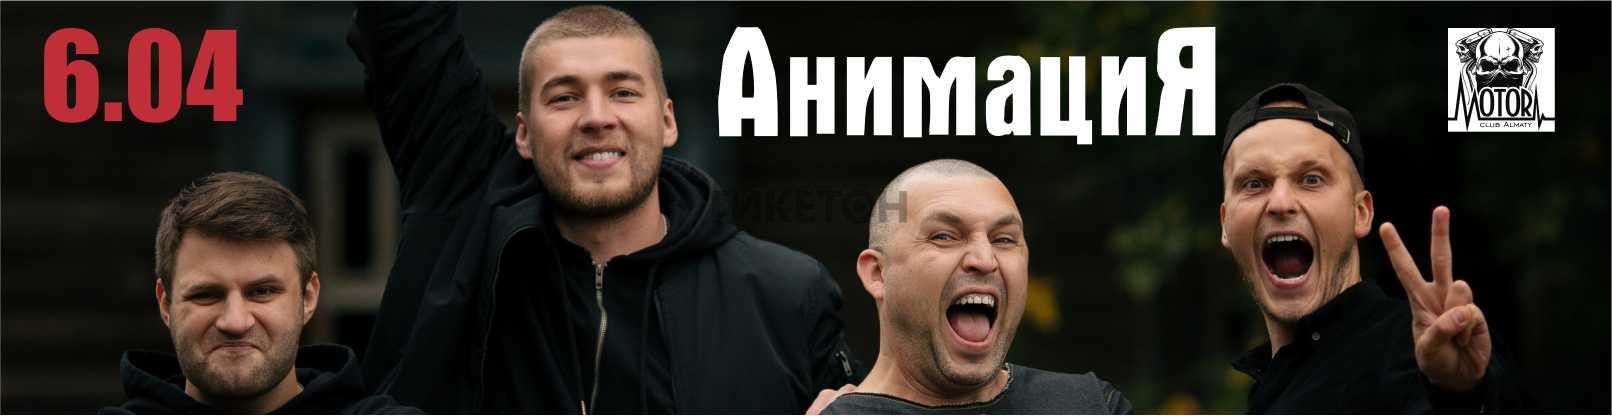 gruppa-animatsiya